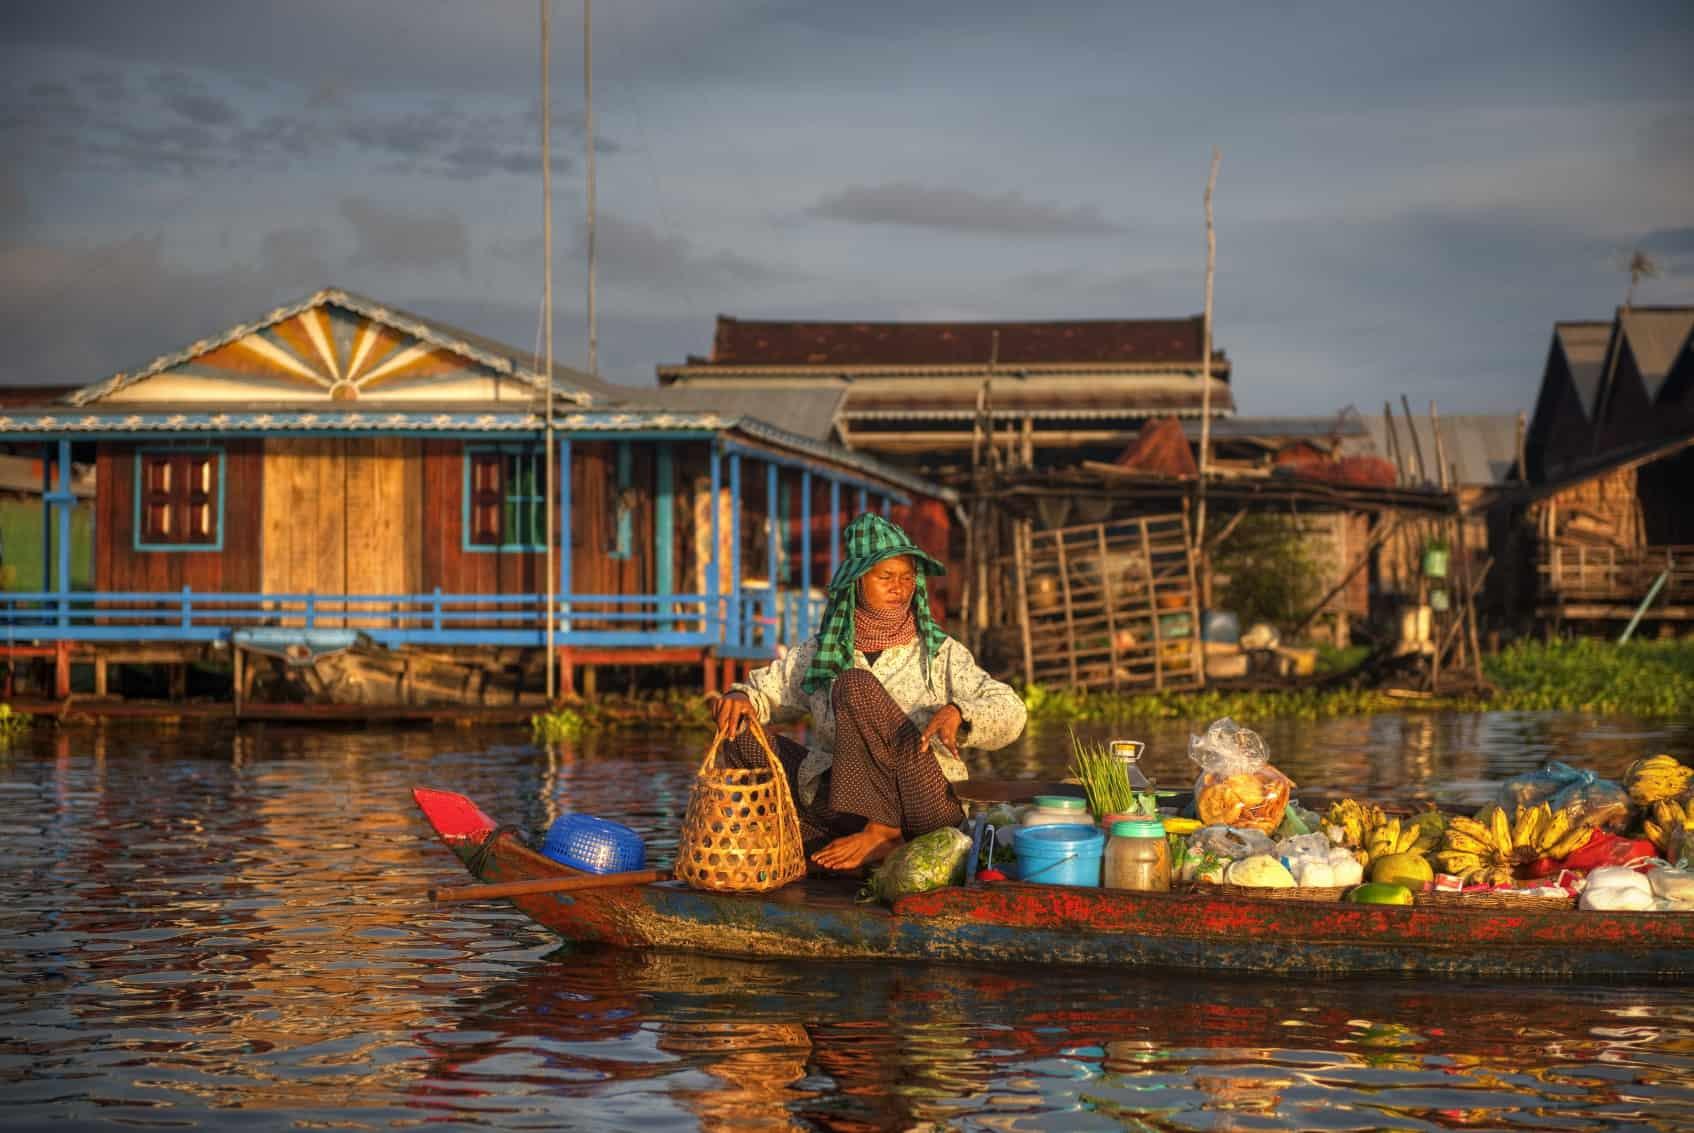 Floating-Village-Kampong-Kleang-Siem-Reap-Cambodia